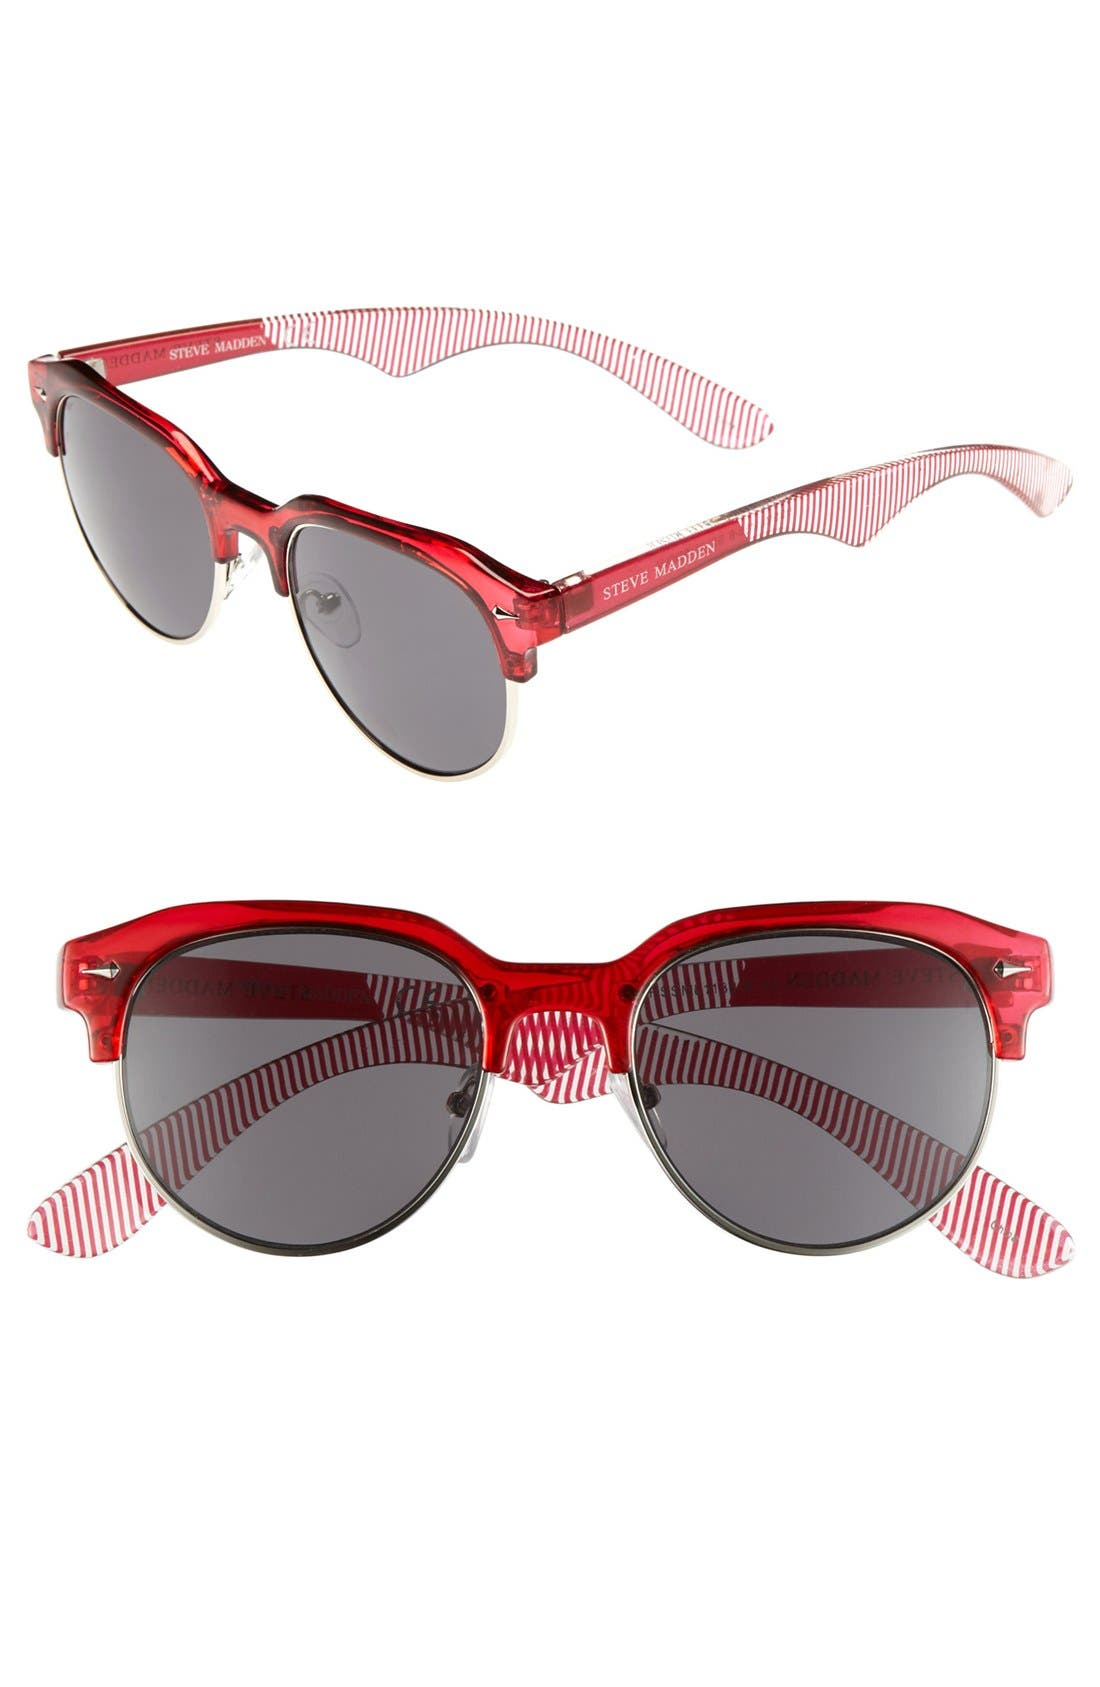 Retro Sunglasses,                             Main thumbnail 1, color,                             Red/ Silver